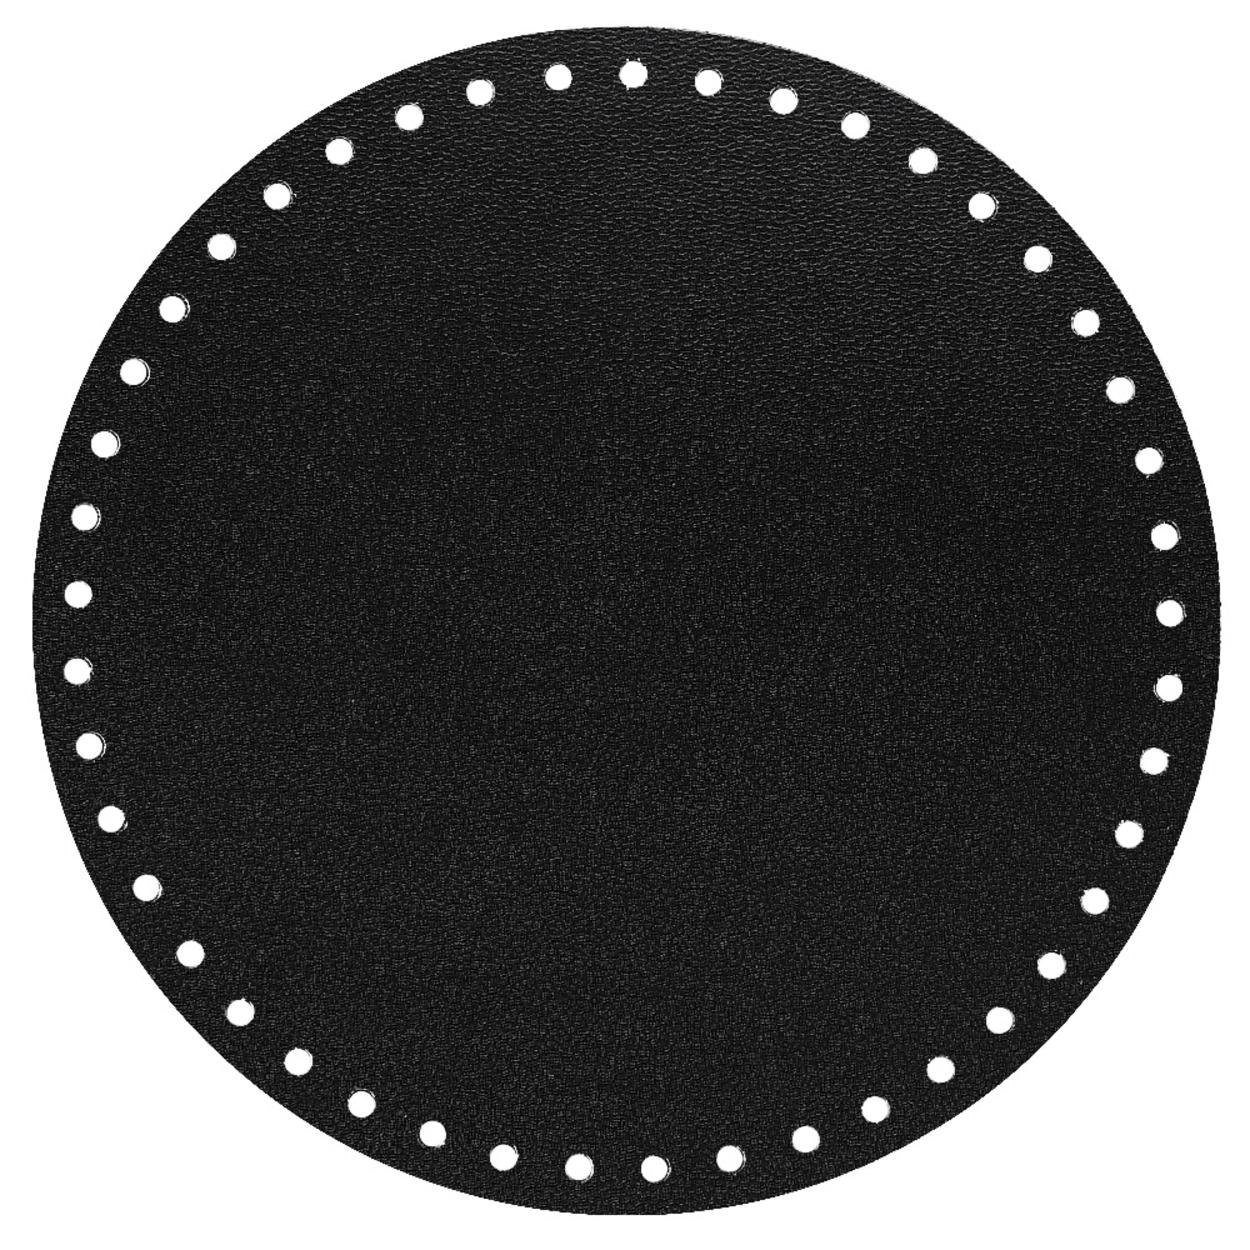 Кожа - Дно для сумки круглое 20 см. Royal black